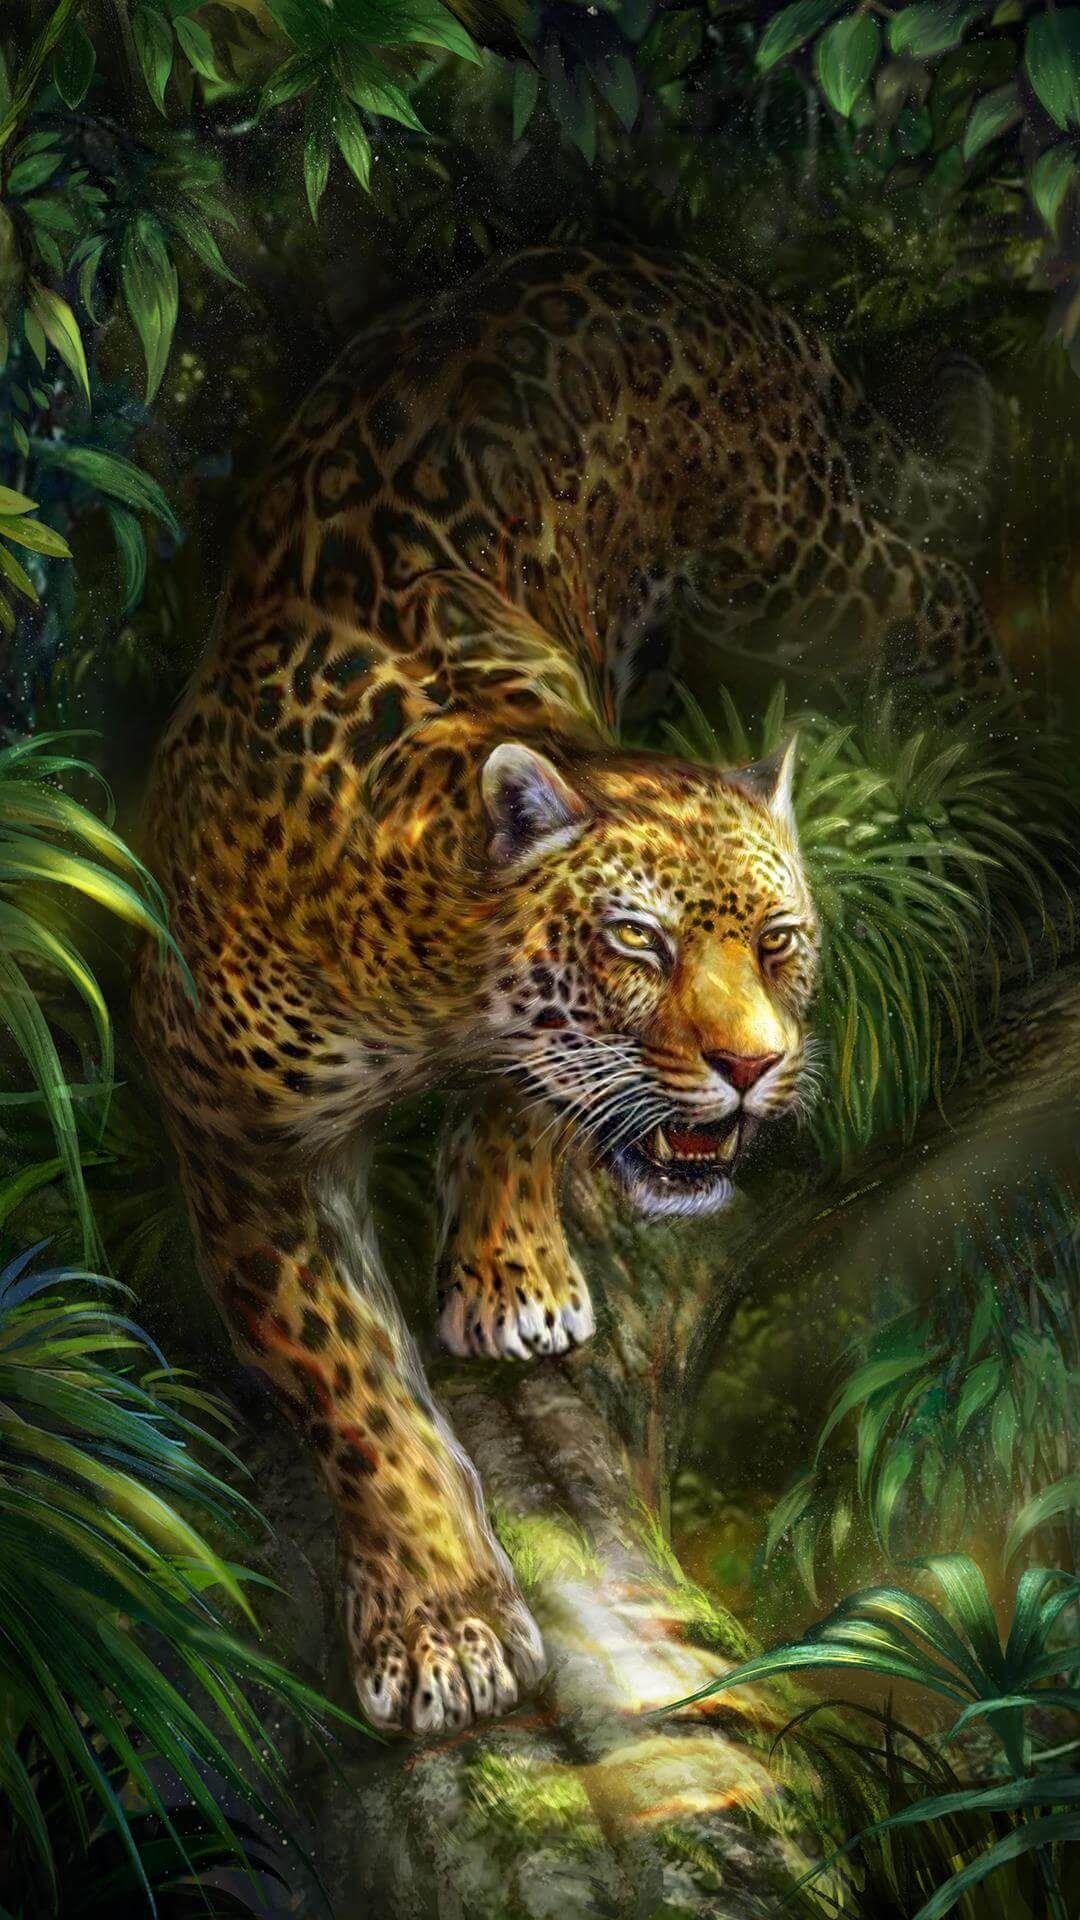 Slinky Leopard In The Forest Live Wallpaper Jaguar Animal Animals Animals Wild